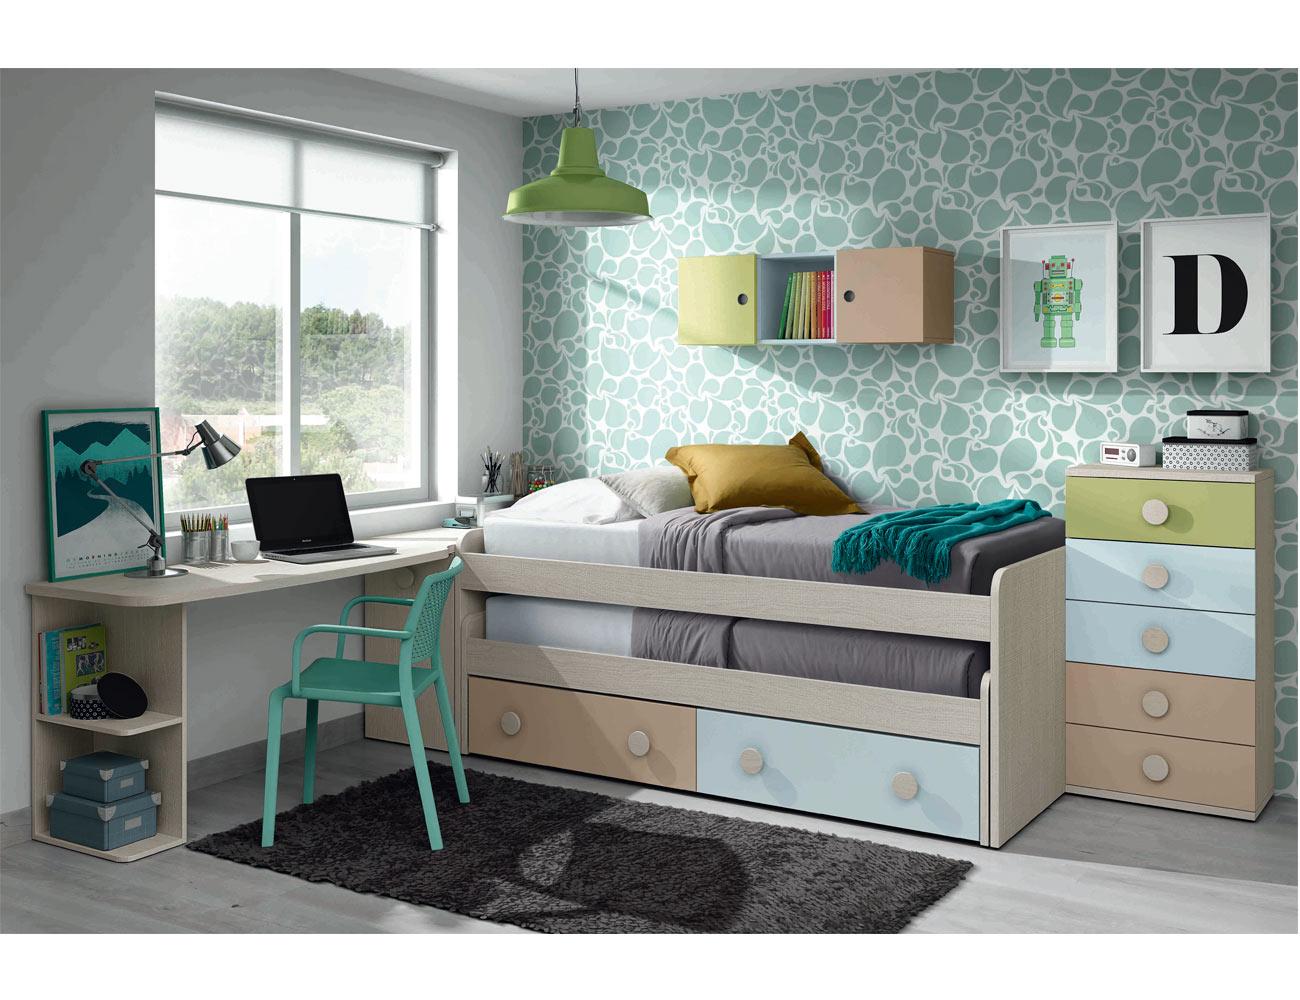 01 dormitorio juvenil